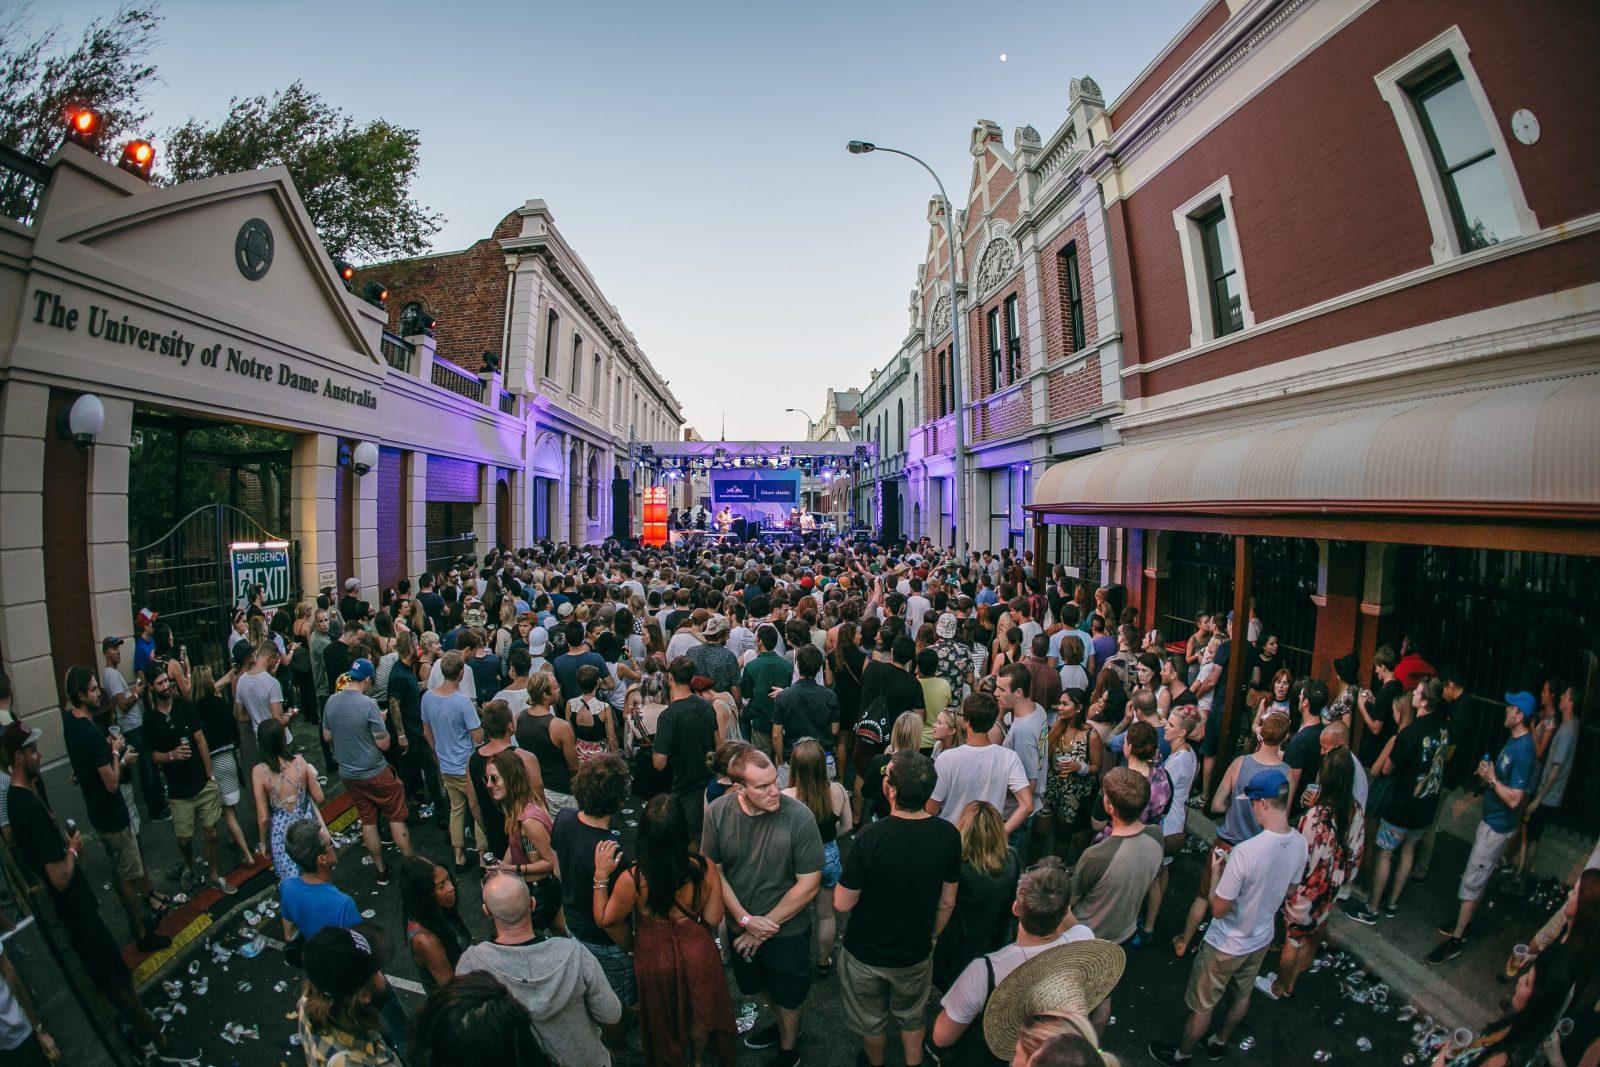 St. Jerome's Laneway Festival 2019, Fremantle, Western Australia